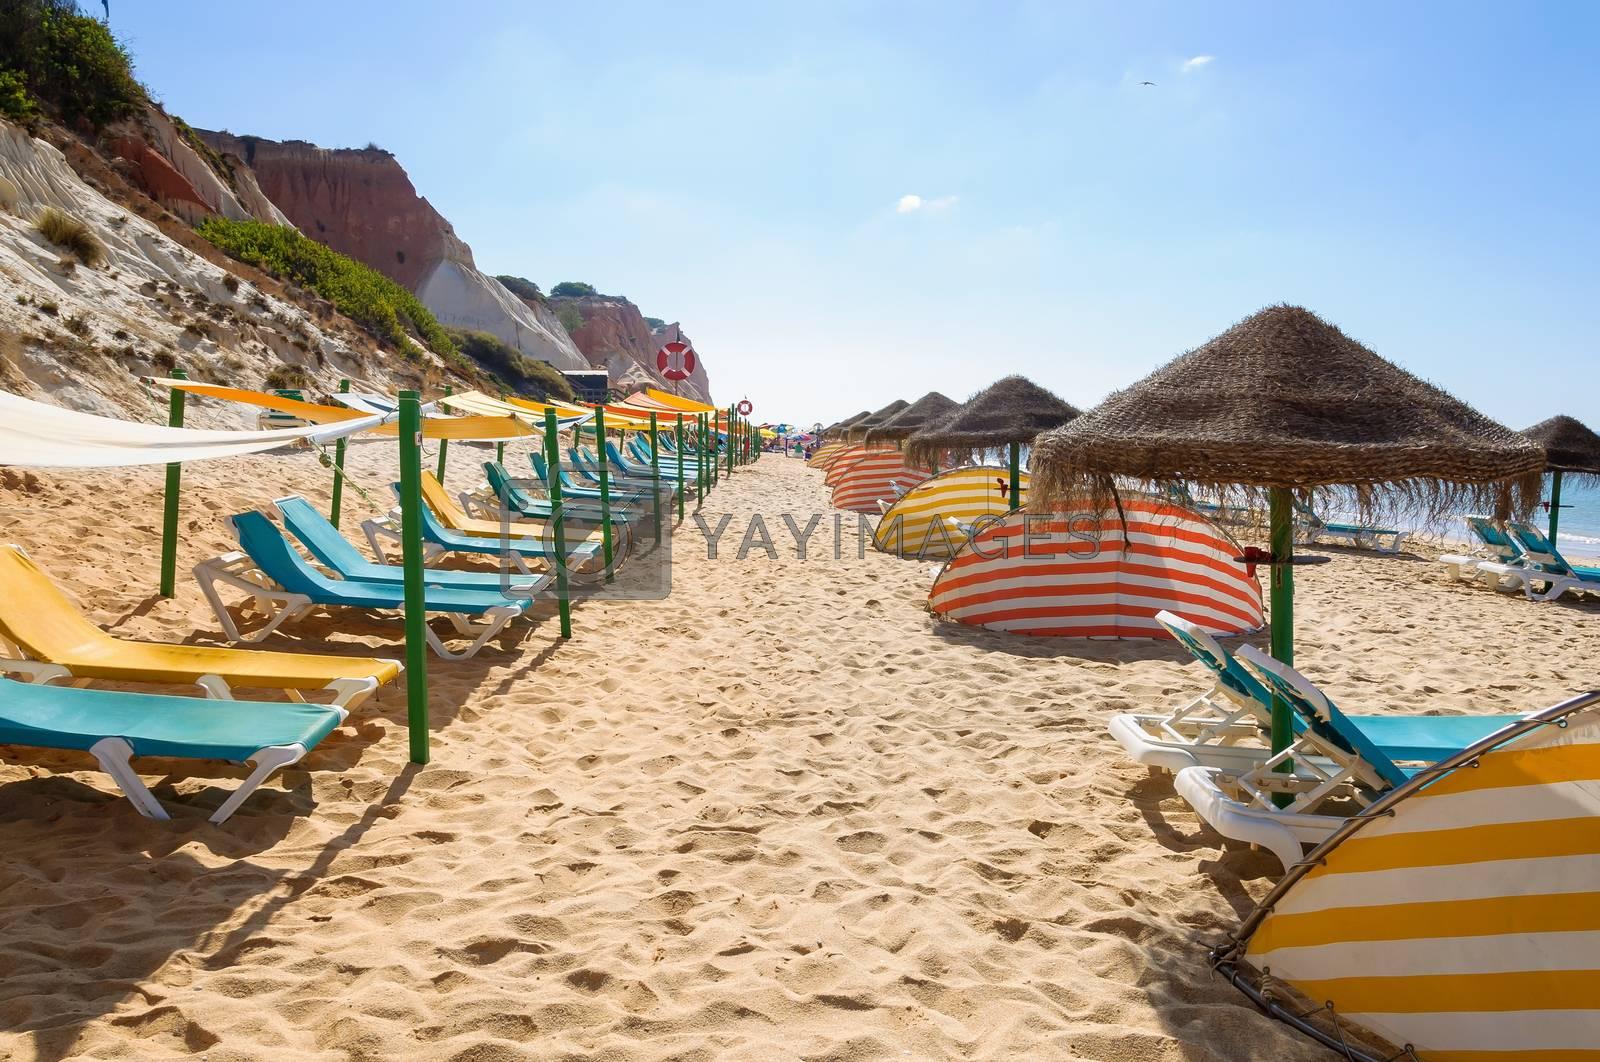 Sunbeds and umbrellas on Falesia Beach, Algarve, Portugal